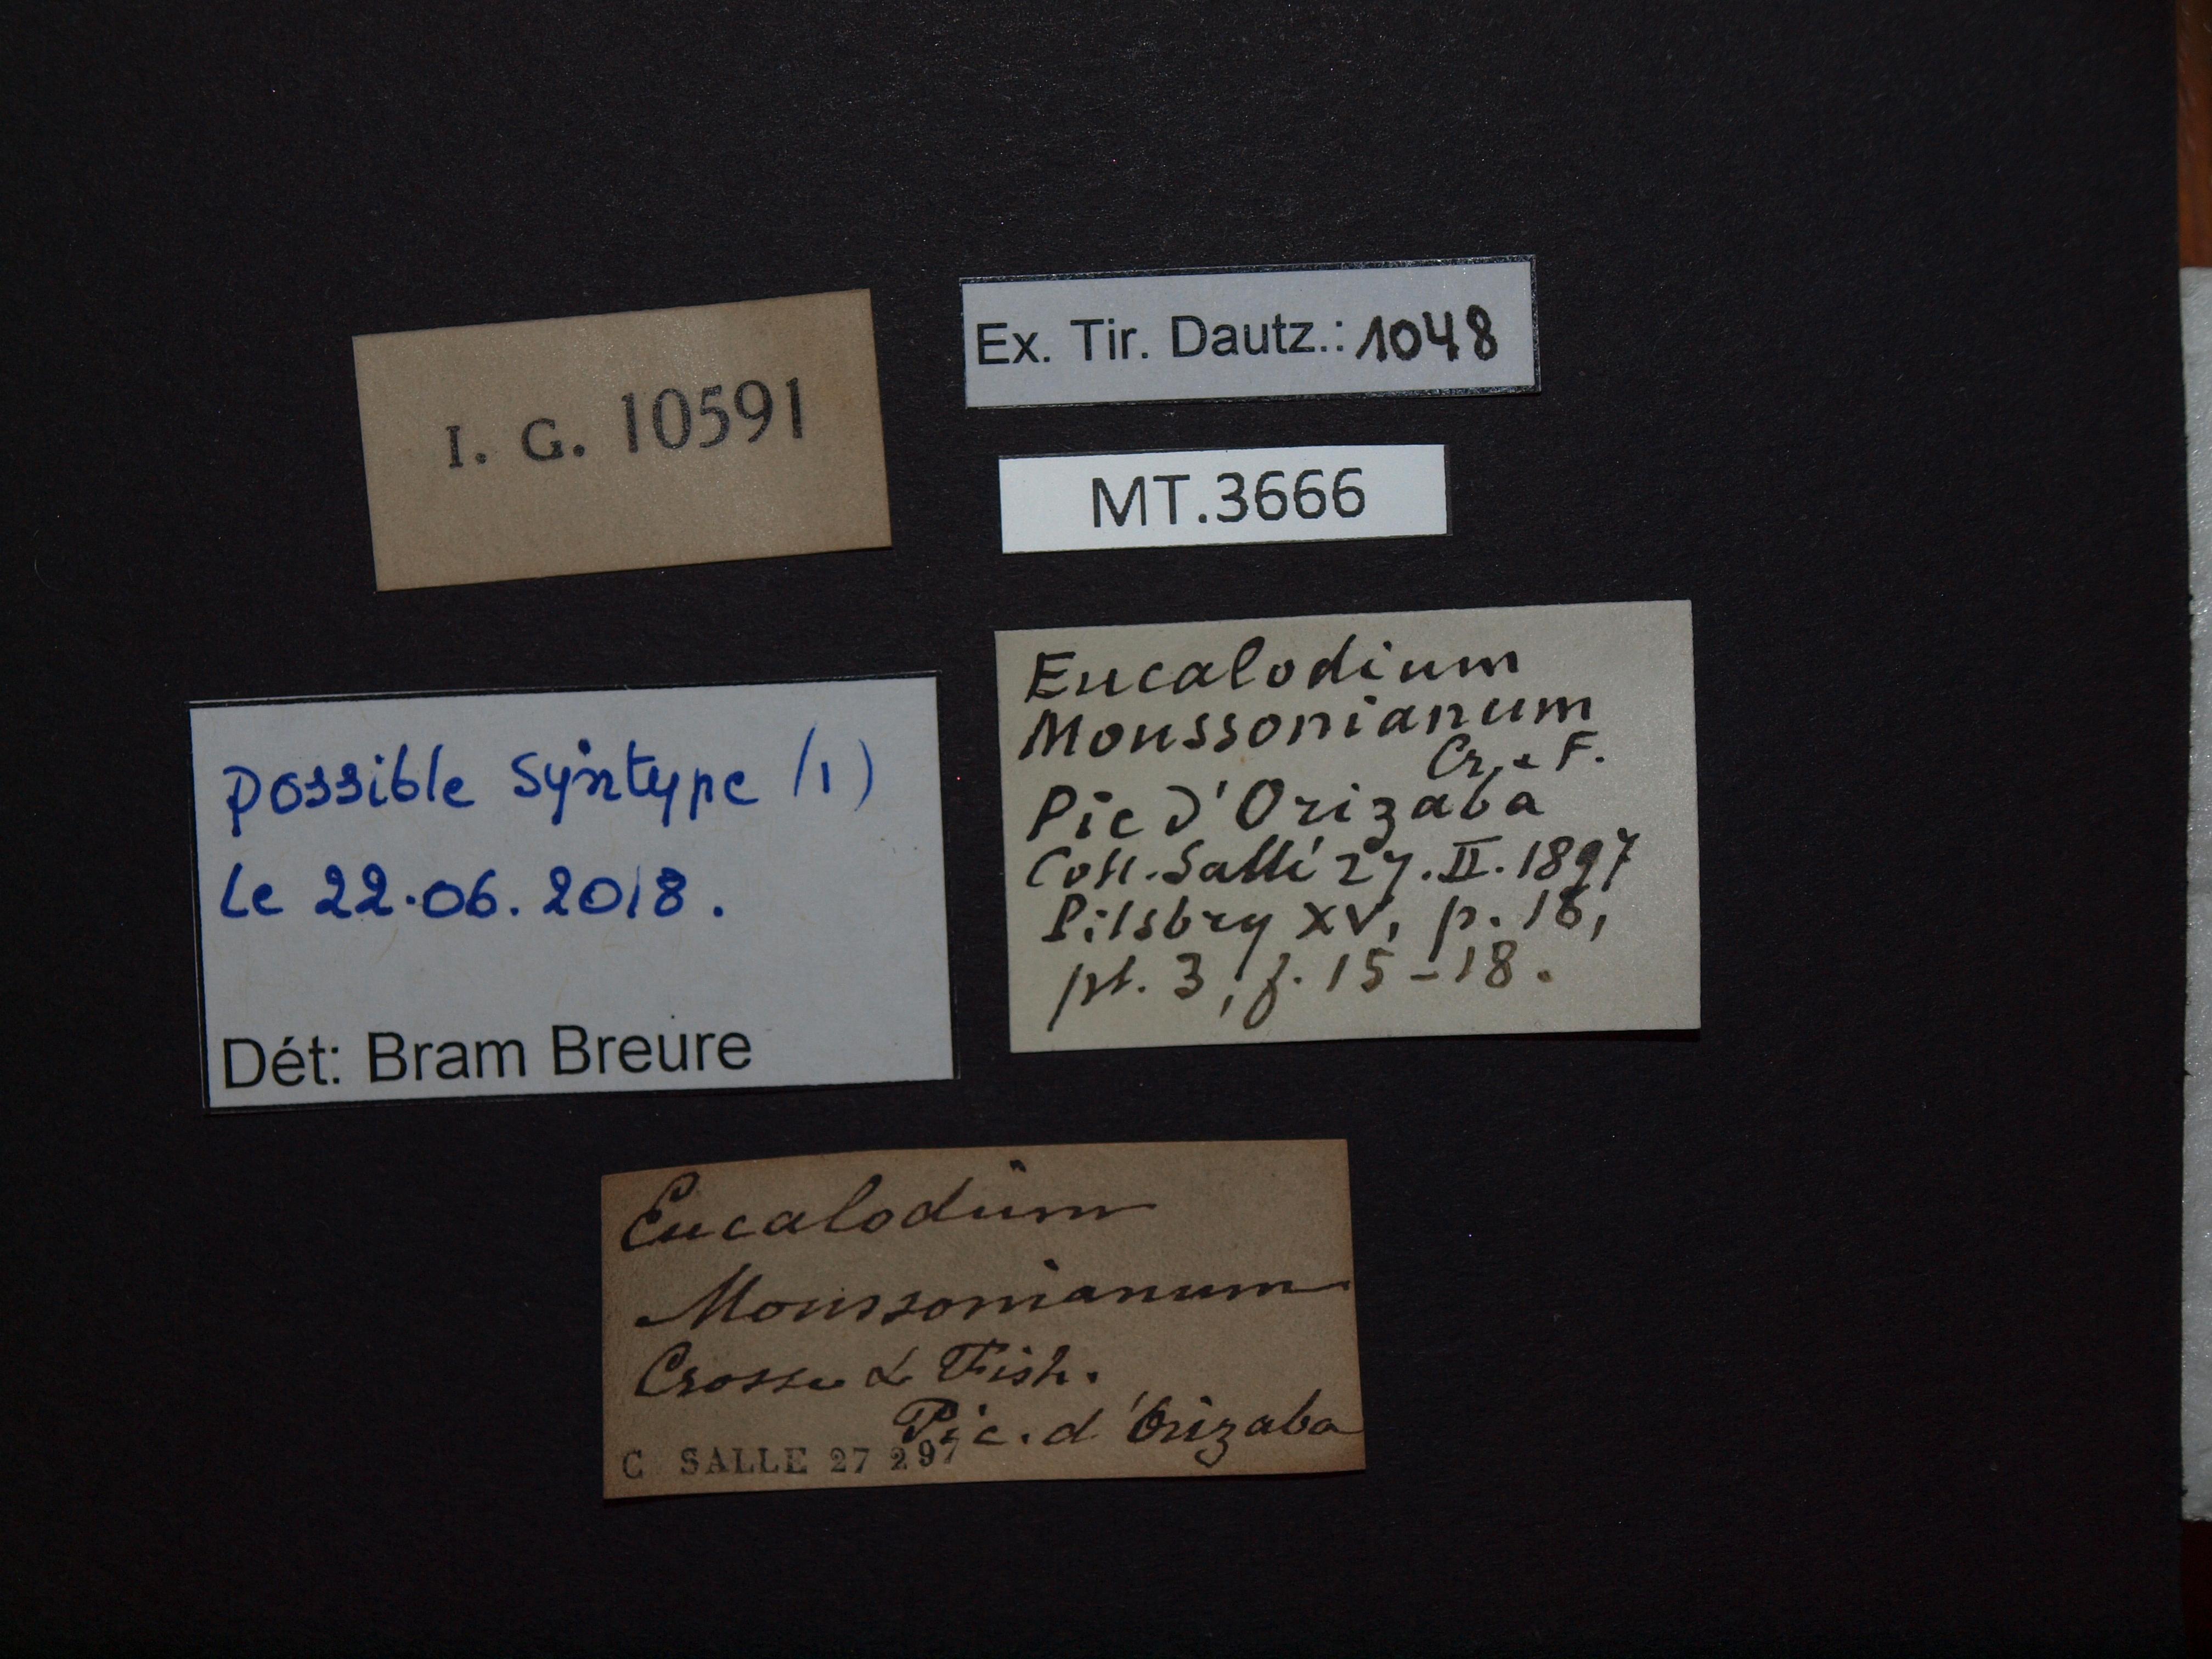 BE-RBINS-INV MT.3666 Eucalodium (Oligostylus) moussonianum st Lb.jpg